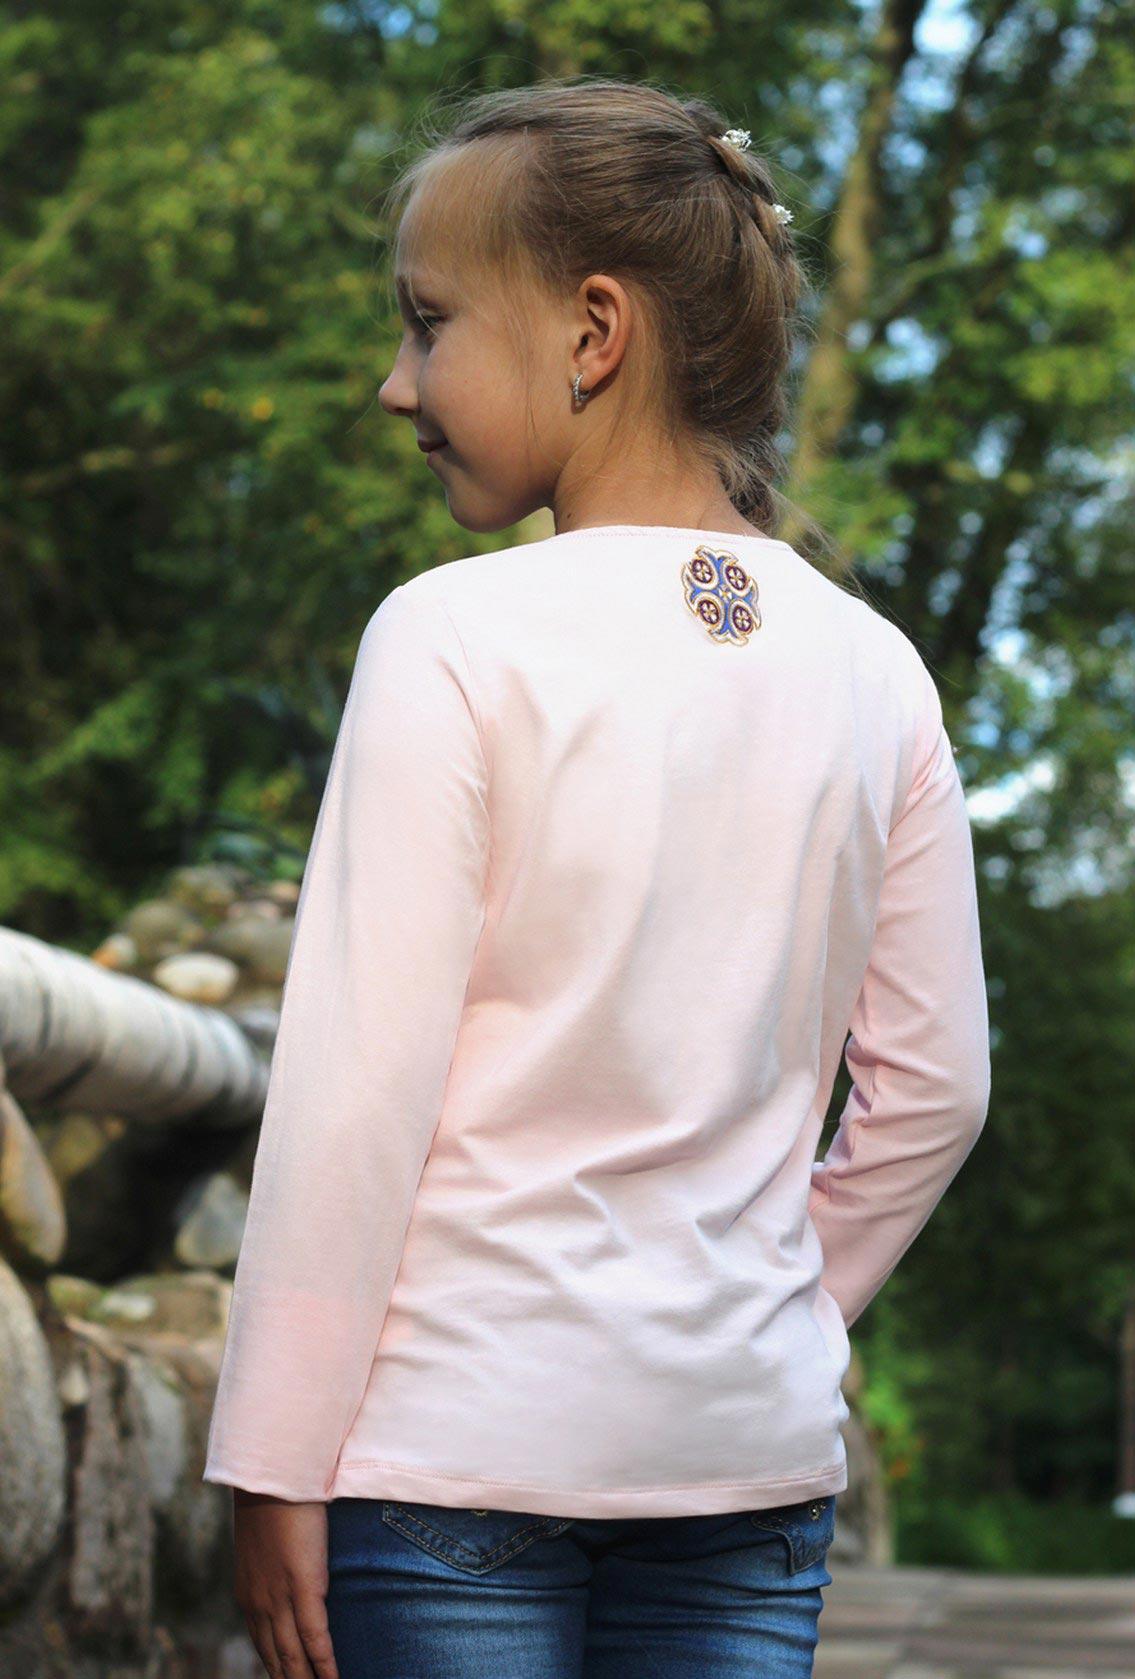 детская православная футболка, children's orthodox t-shirt